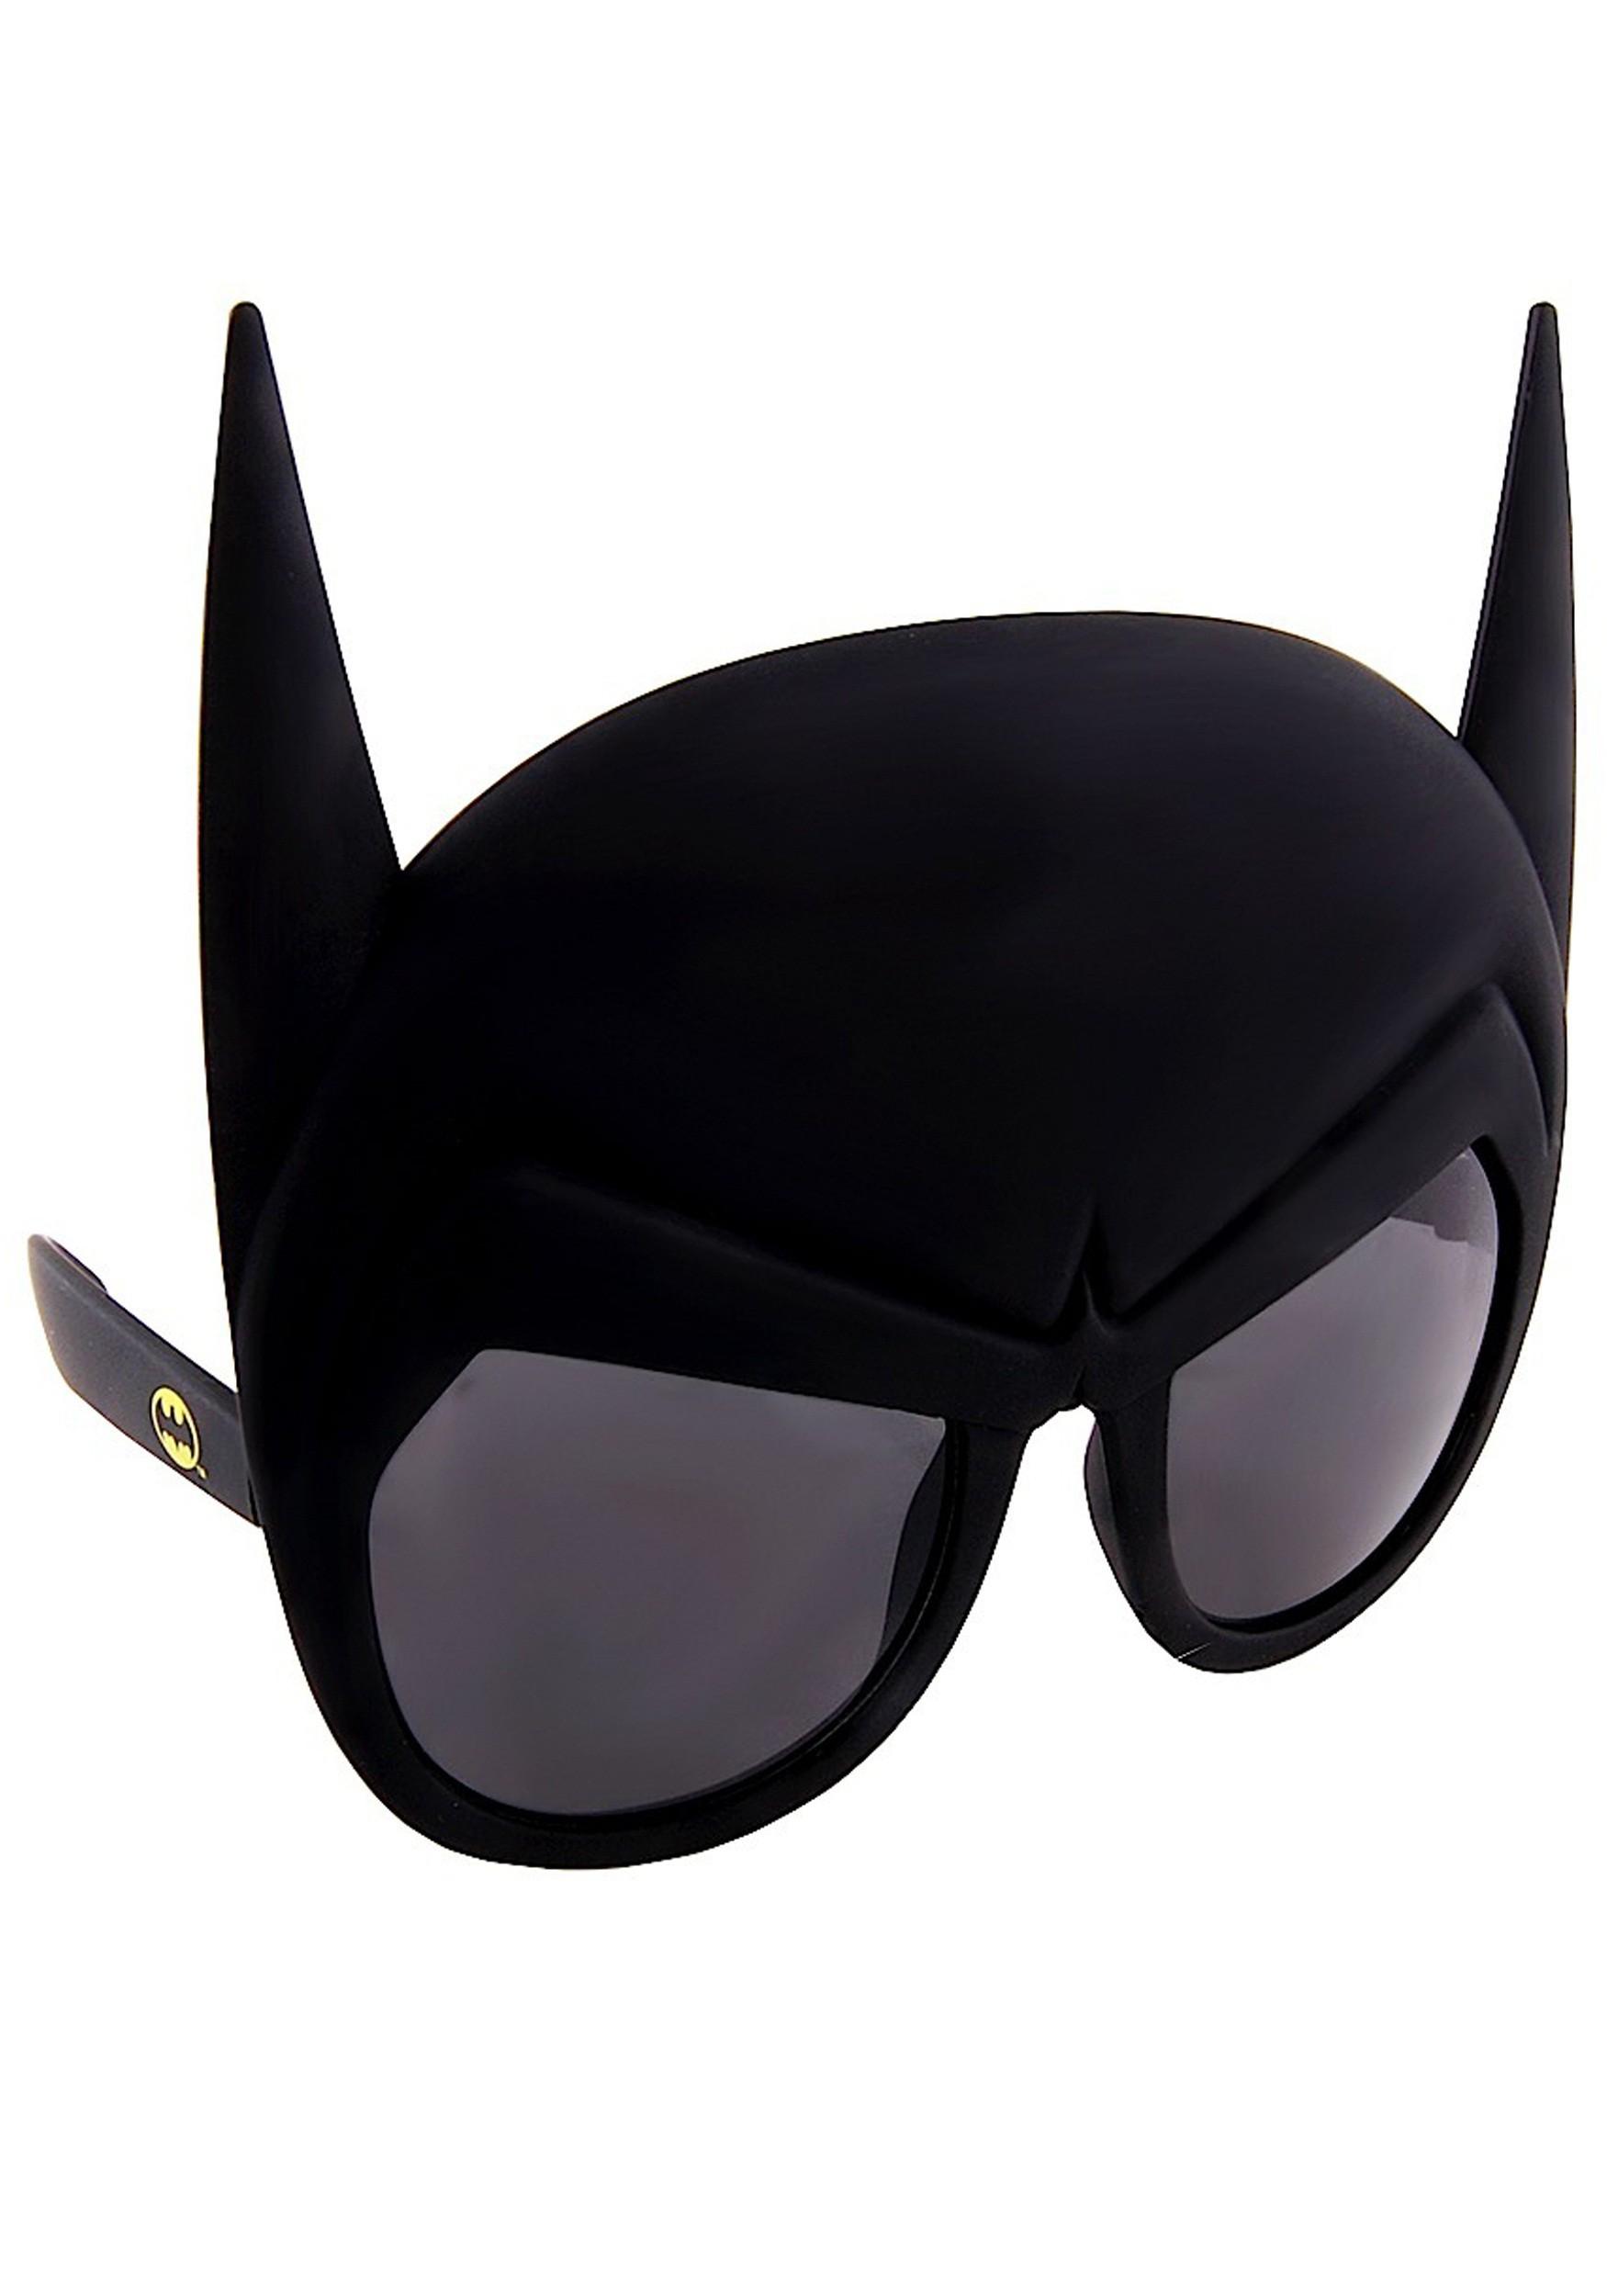 08f90cc05d batman-glasses.jpg